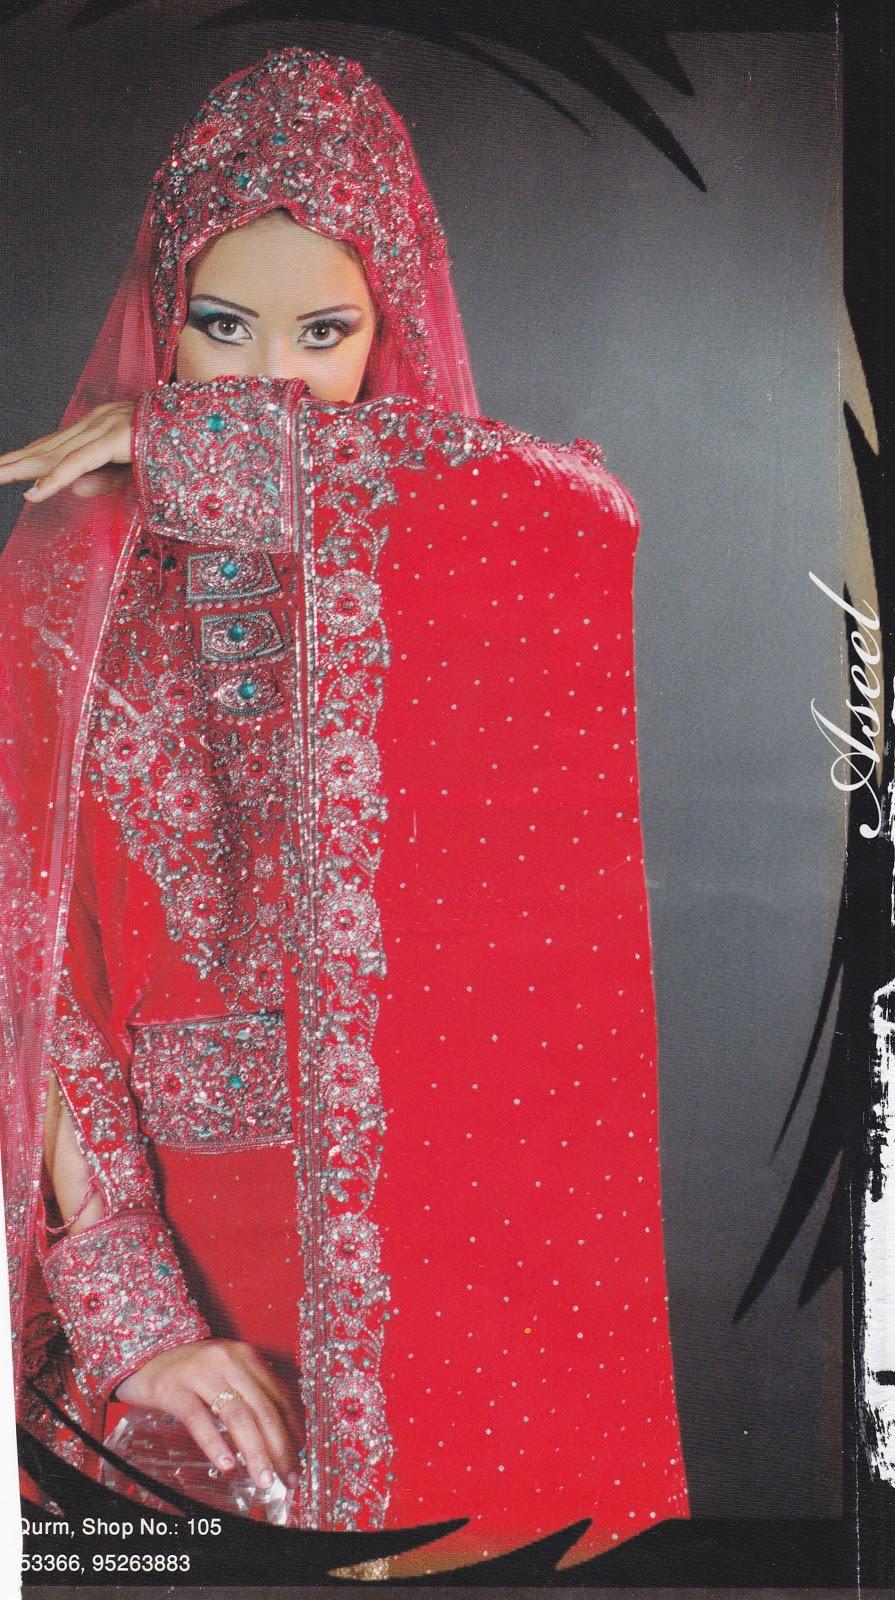 Simple  Handbags For Sale Omani Dresses Forward Omani Fashion Pin 5 Heart 2